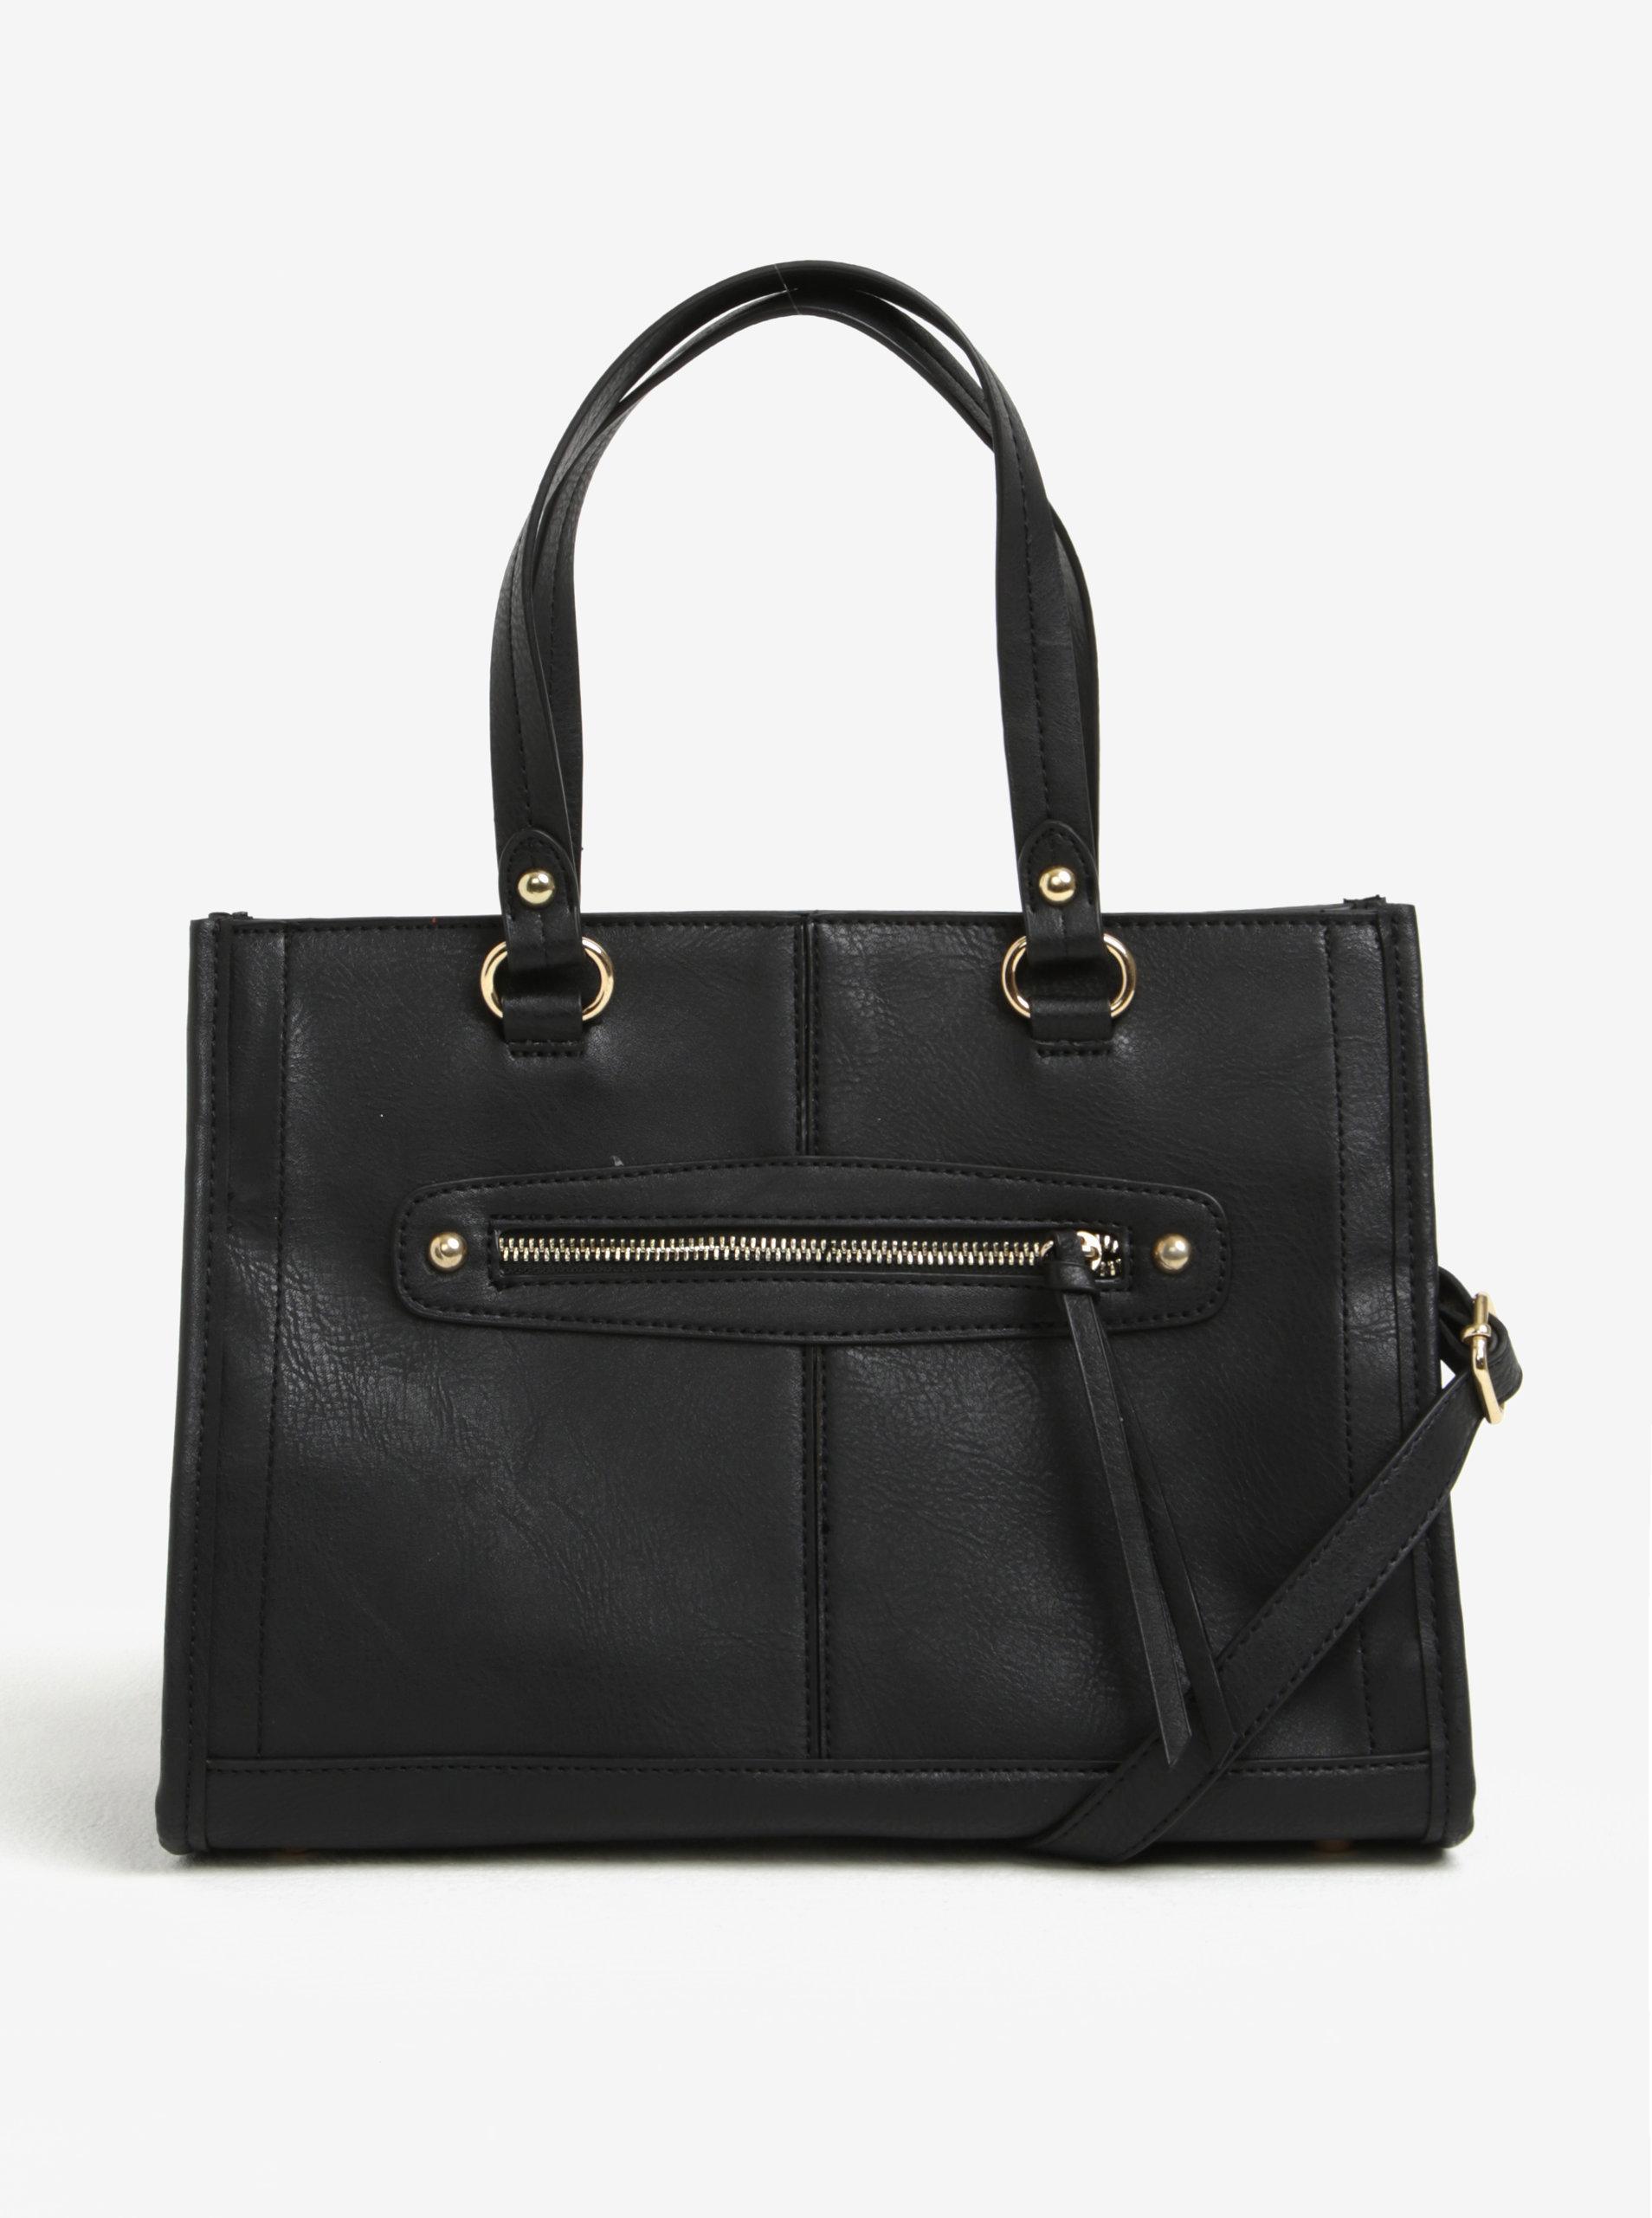 8f57b8f61d Čierna kabelka do ruky so zipsom v zlatej farbe Dorothy Perkins ...